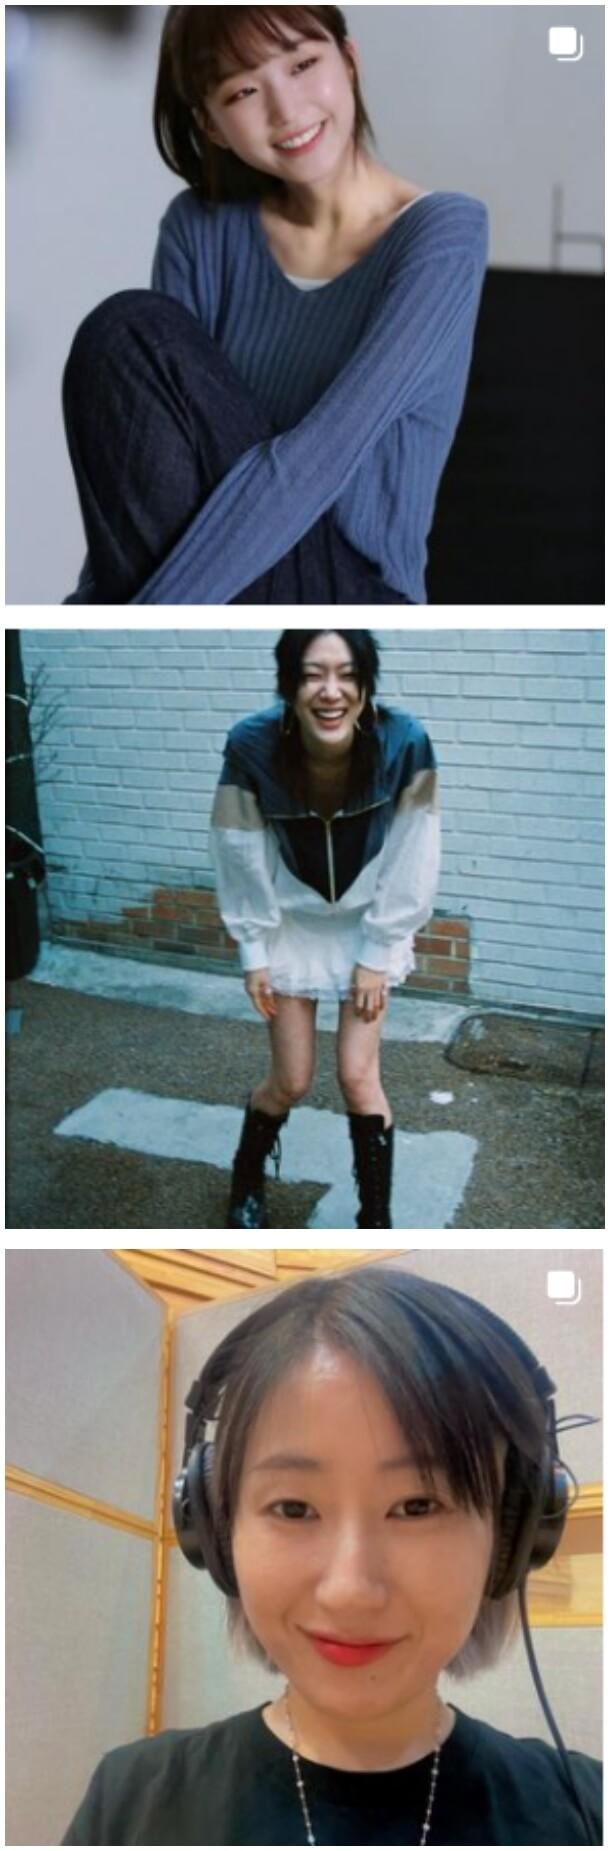 INFP-연예인-순서대로-김이후-최소라-요아리-사진